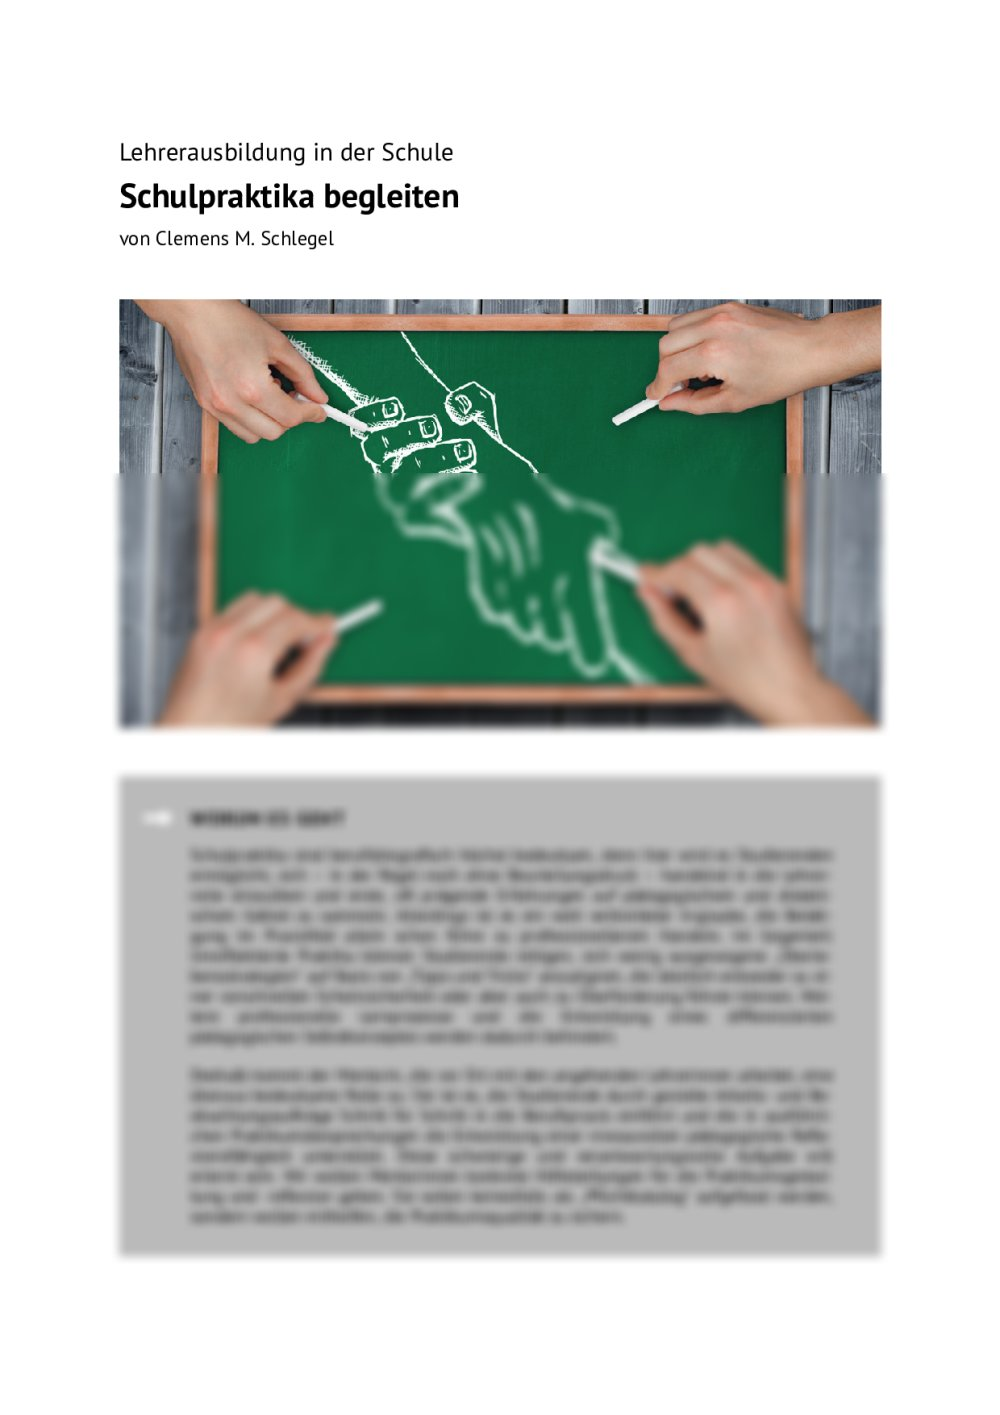 Schulpraktika begleiten - Seite 1